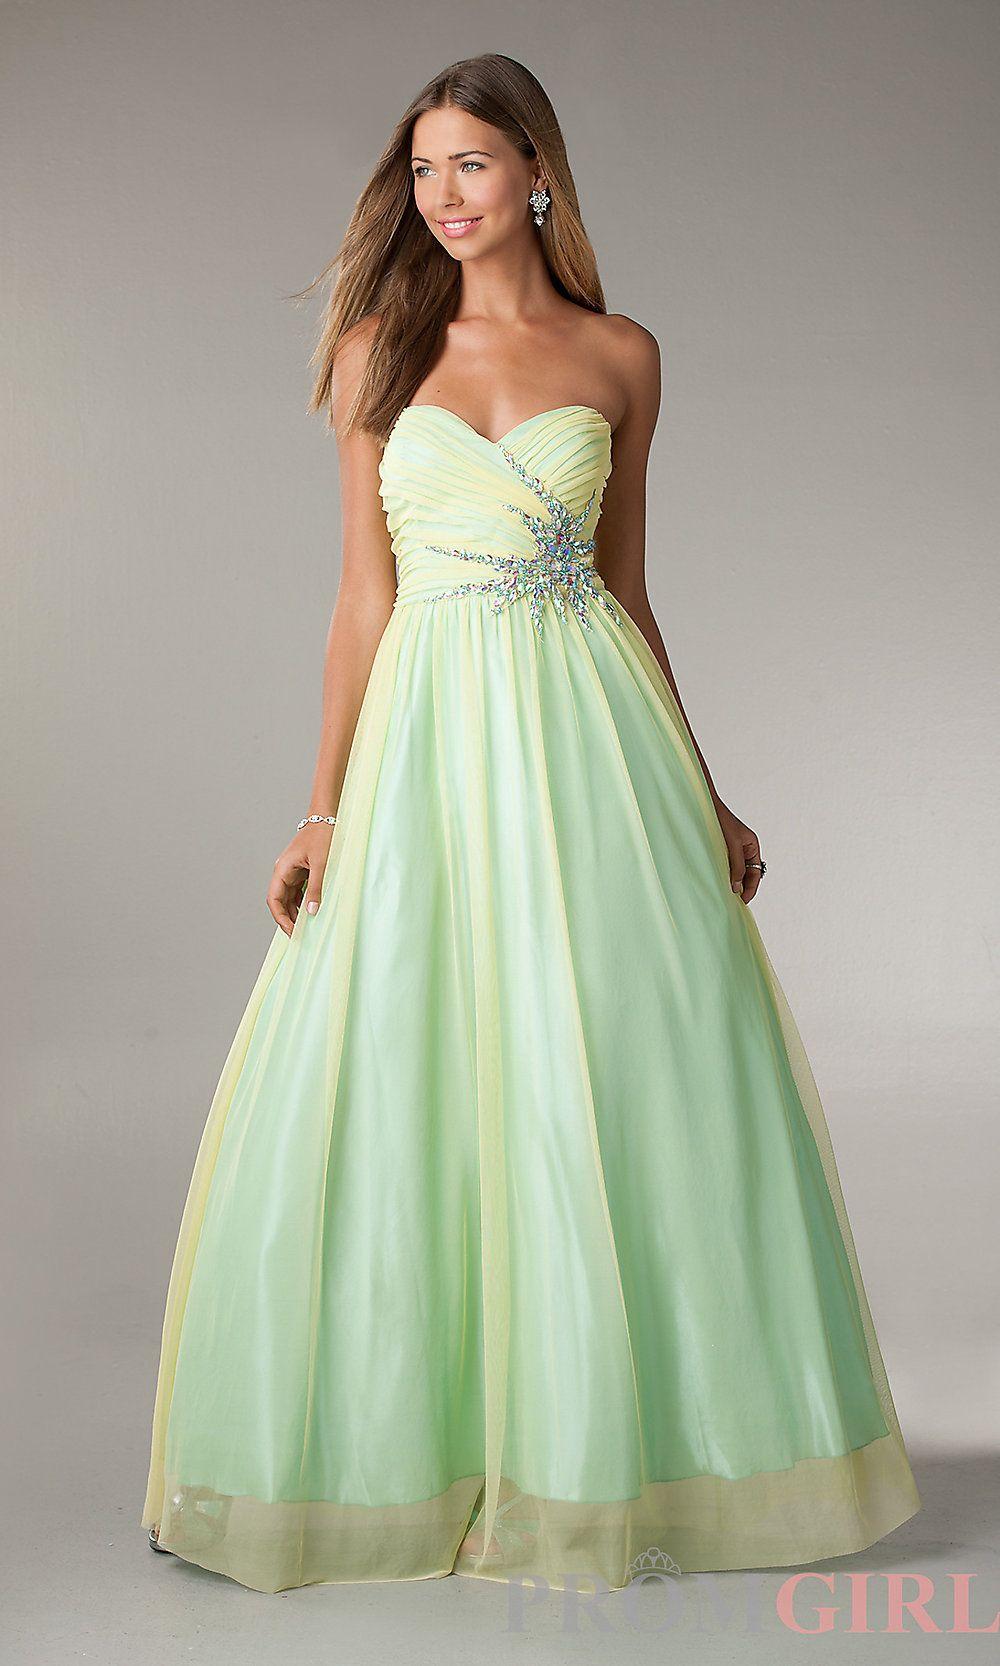 Long Strapless A-Line Prom Dress on Wanelo | Dresses | Pinterest ...